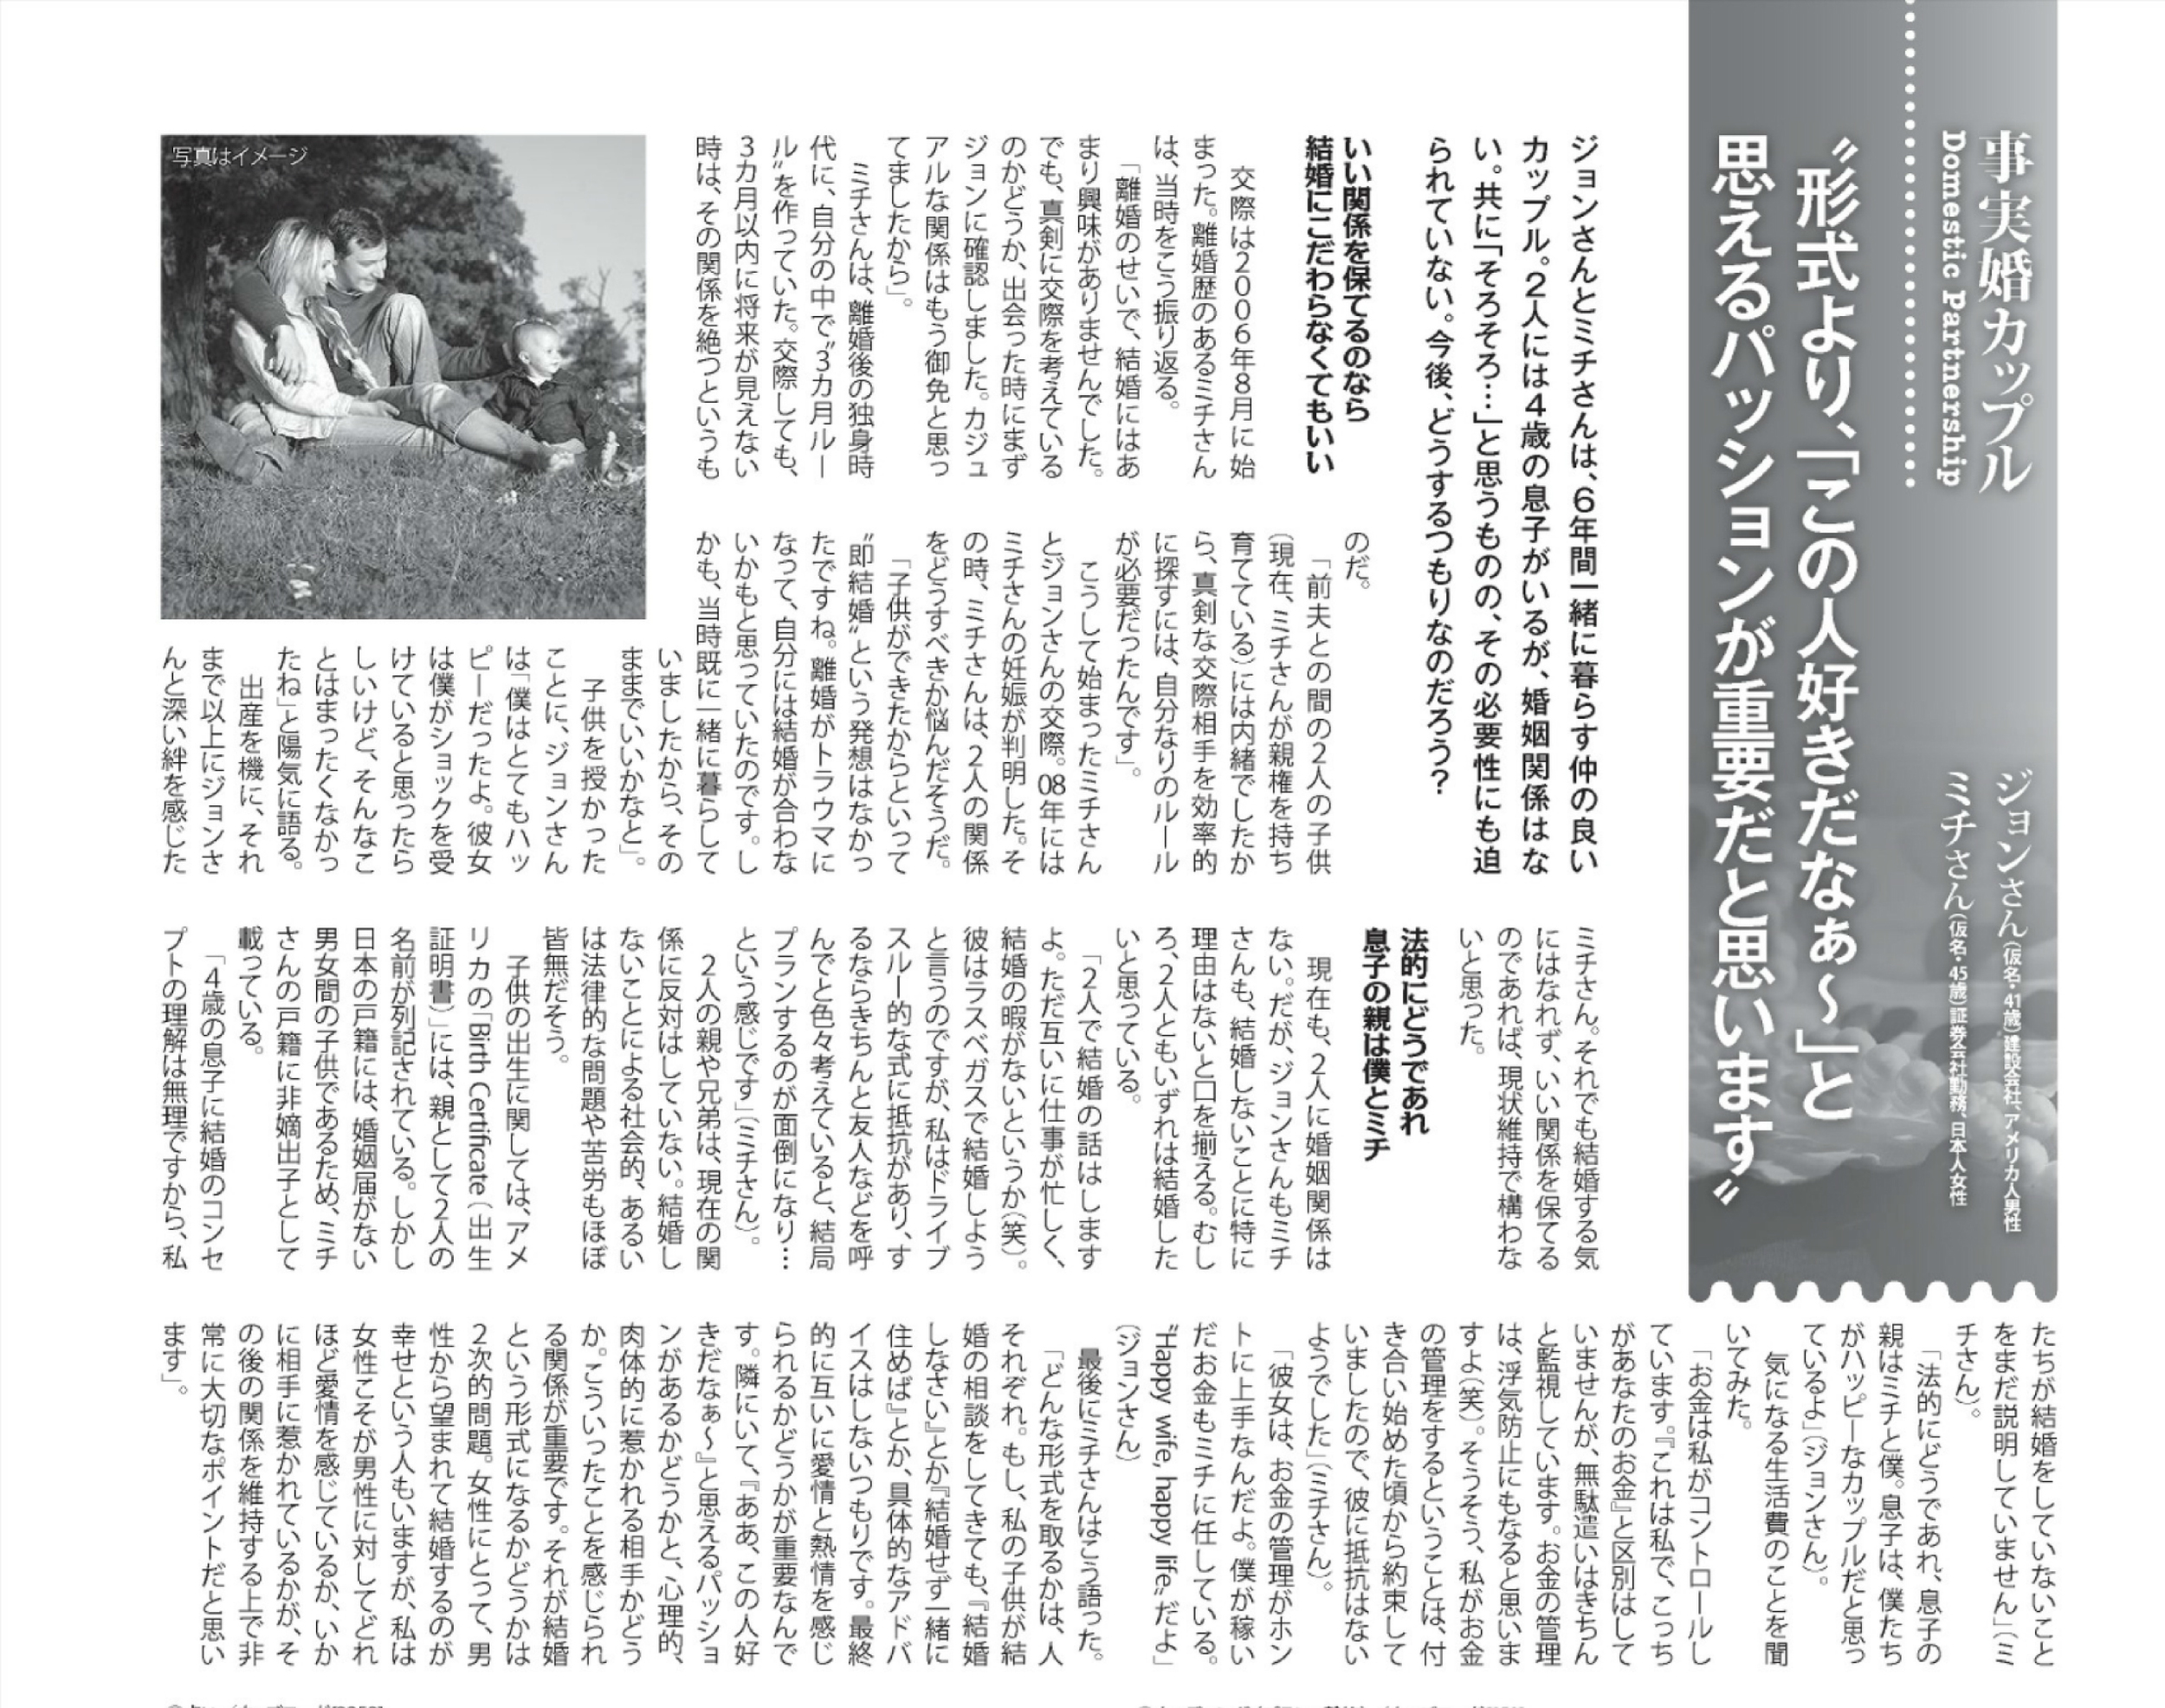 Lighthouse LA May 1, 2012 Page-1-3.jpg